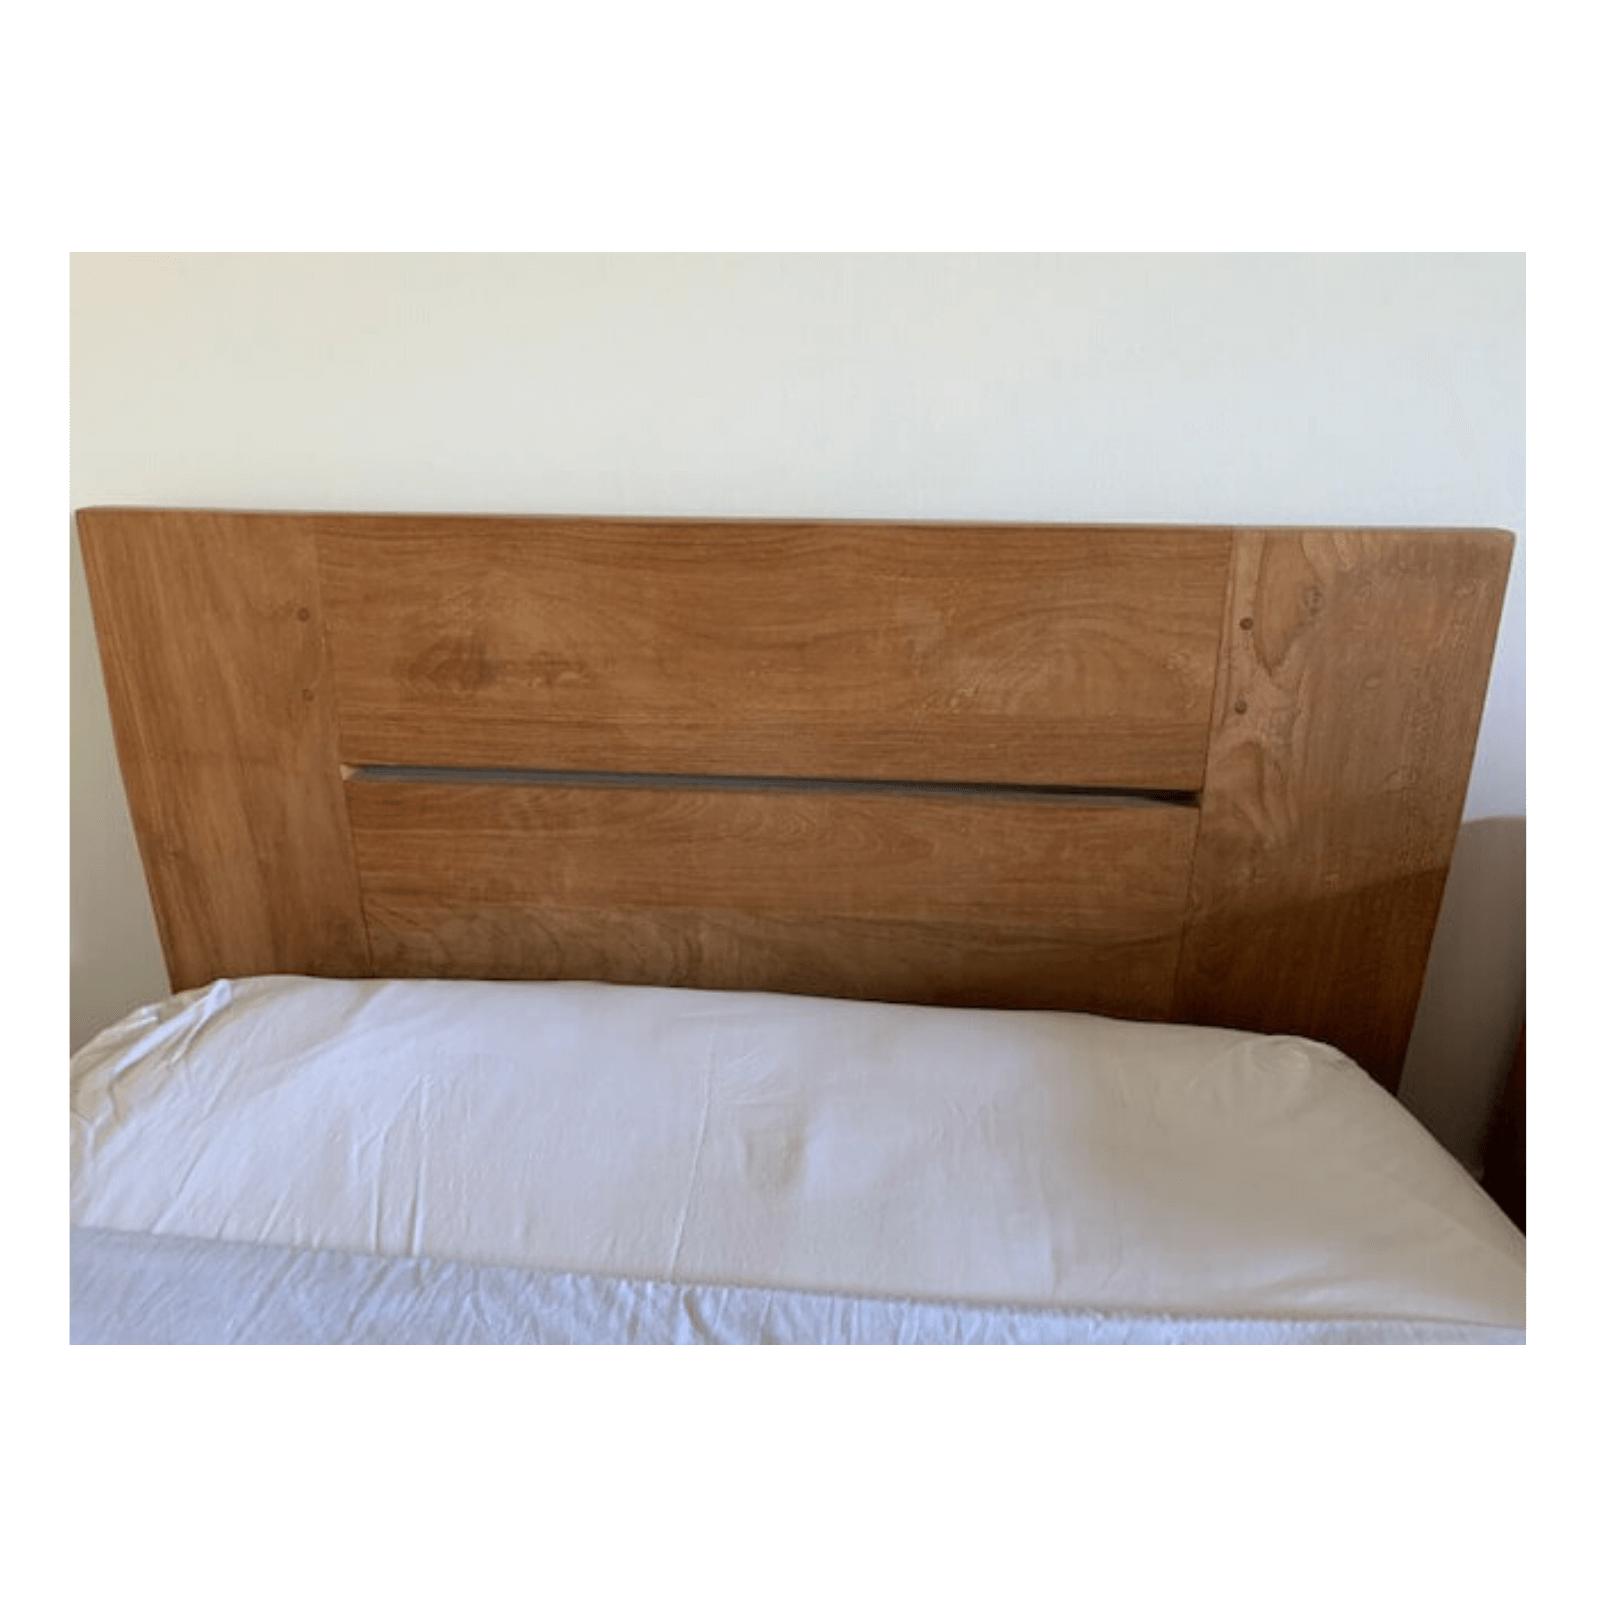 Two Design Lovers Ethnicraft Teak Bed headboard